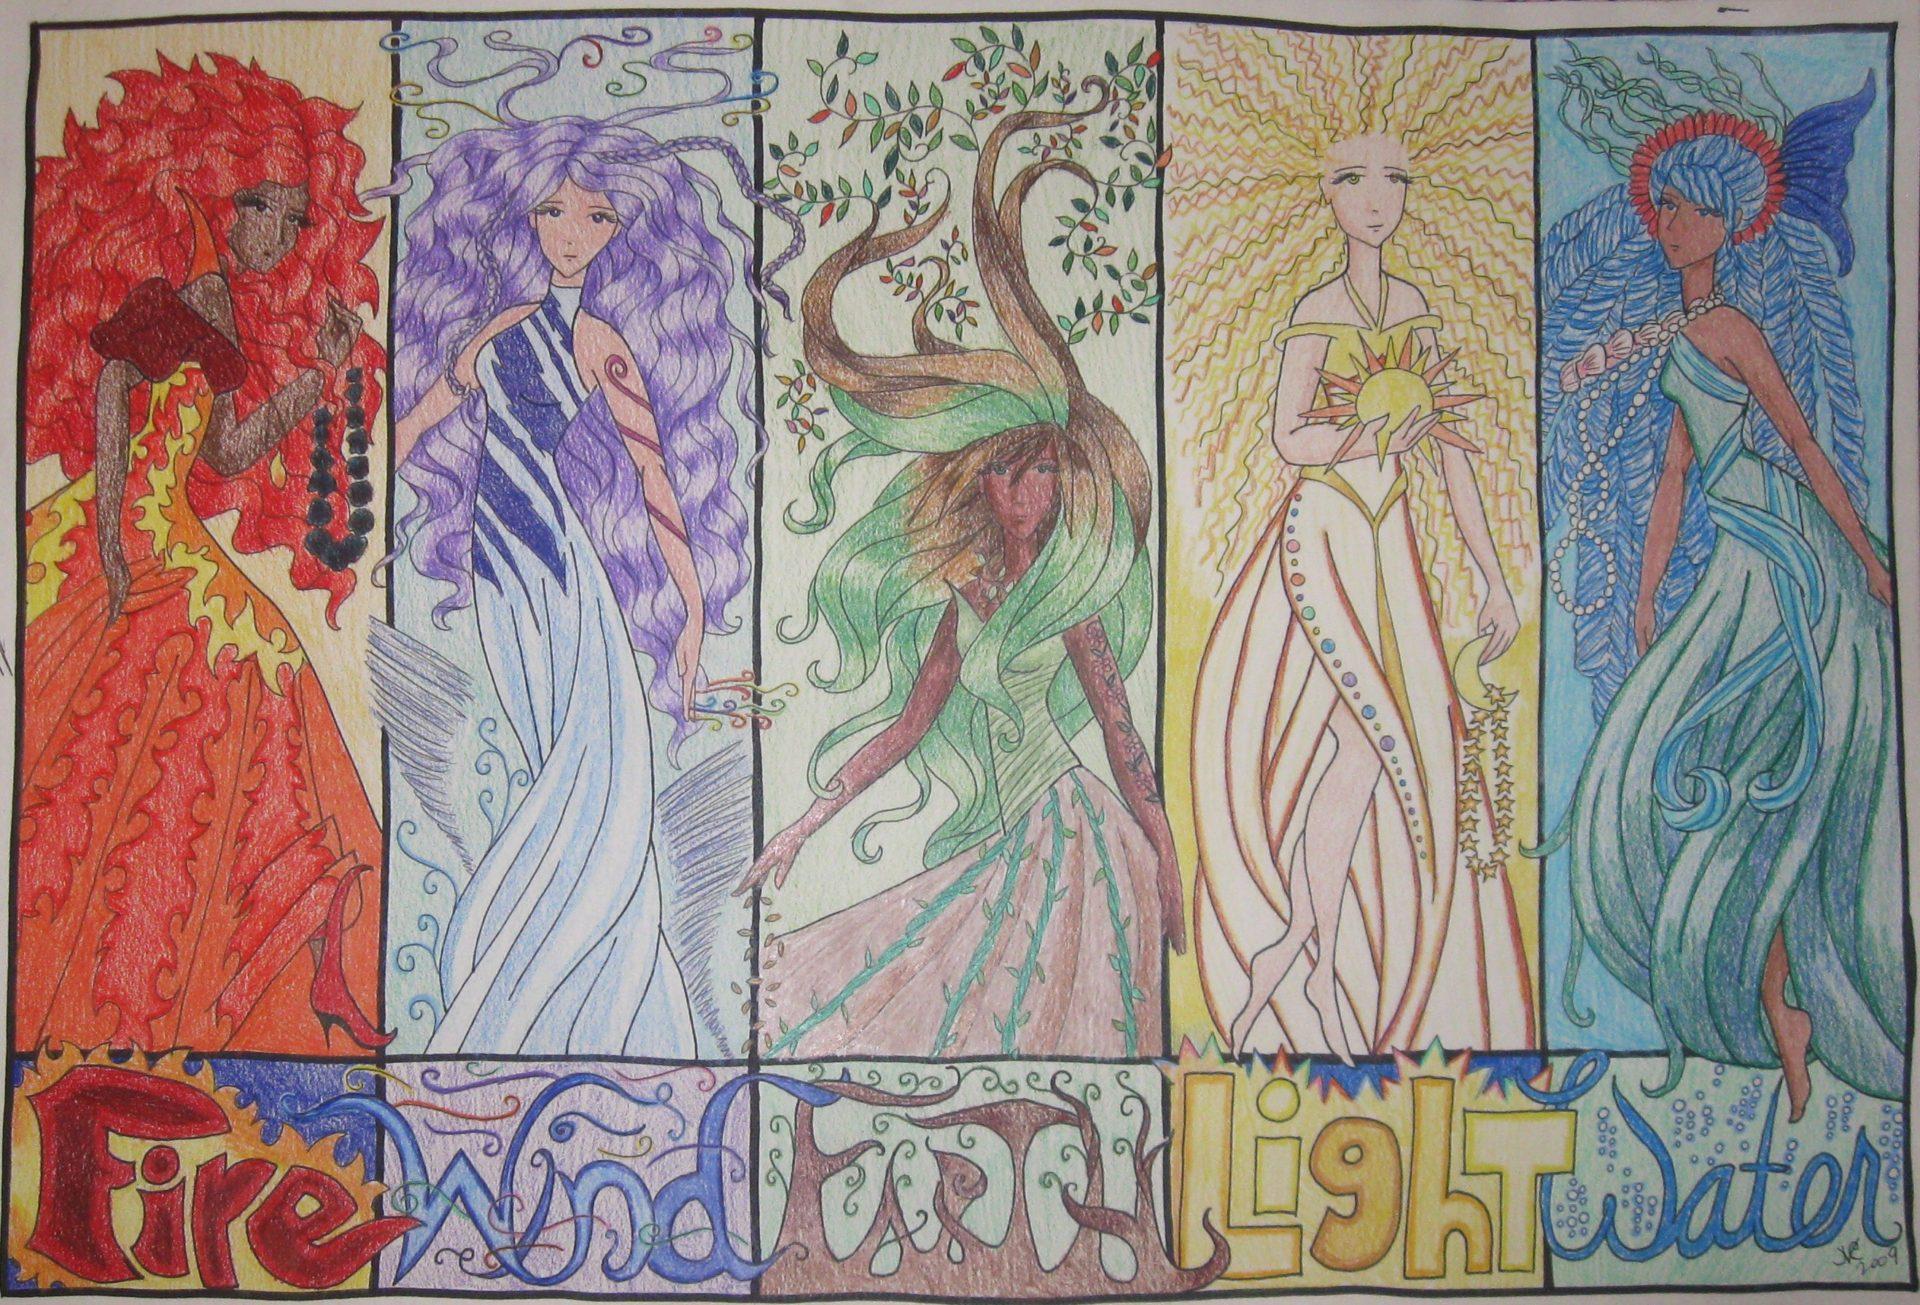 Elemental, 2009, 12x16, Colored Pencil